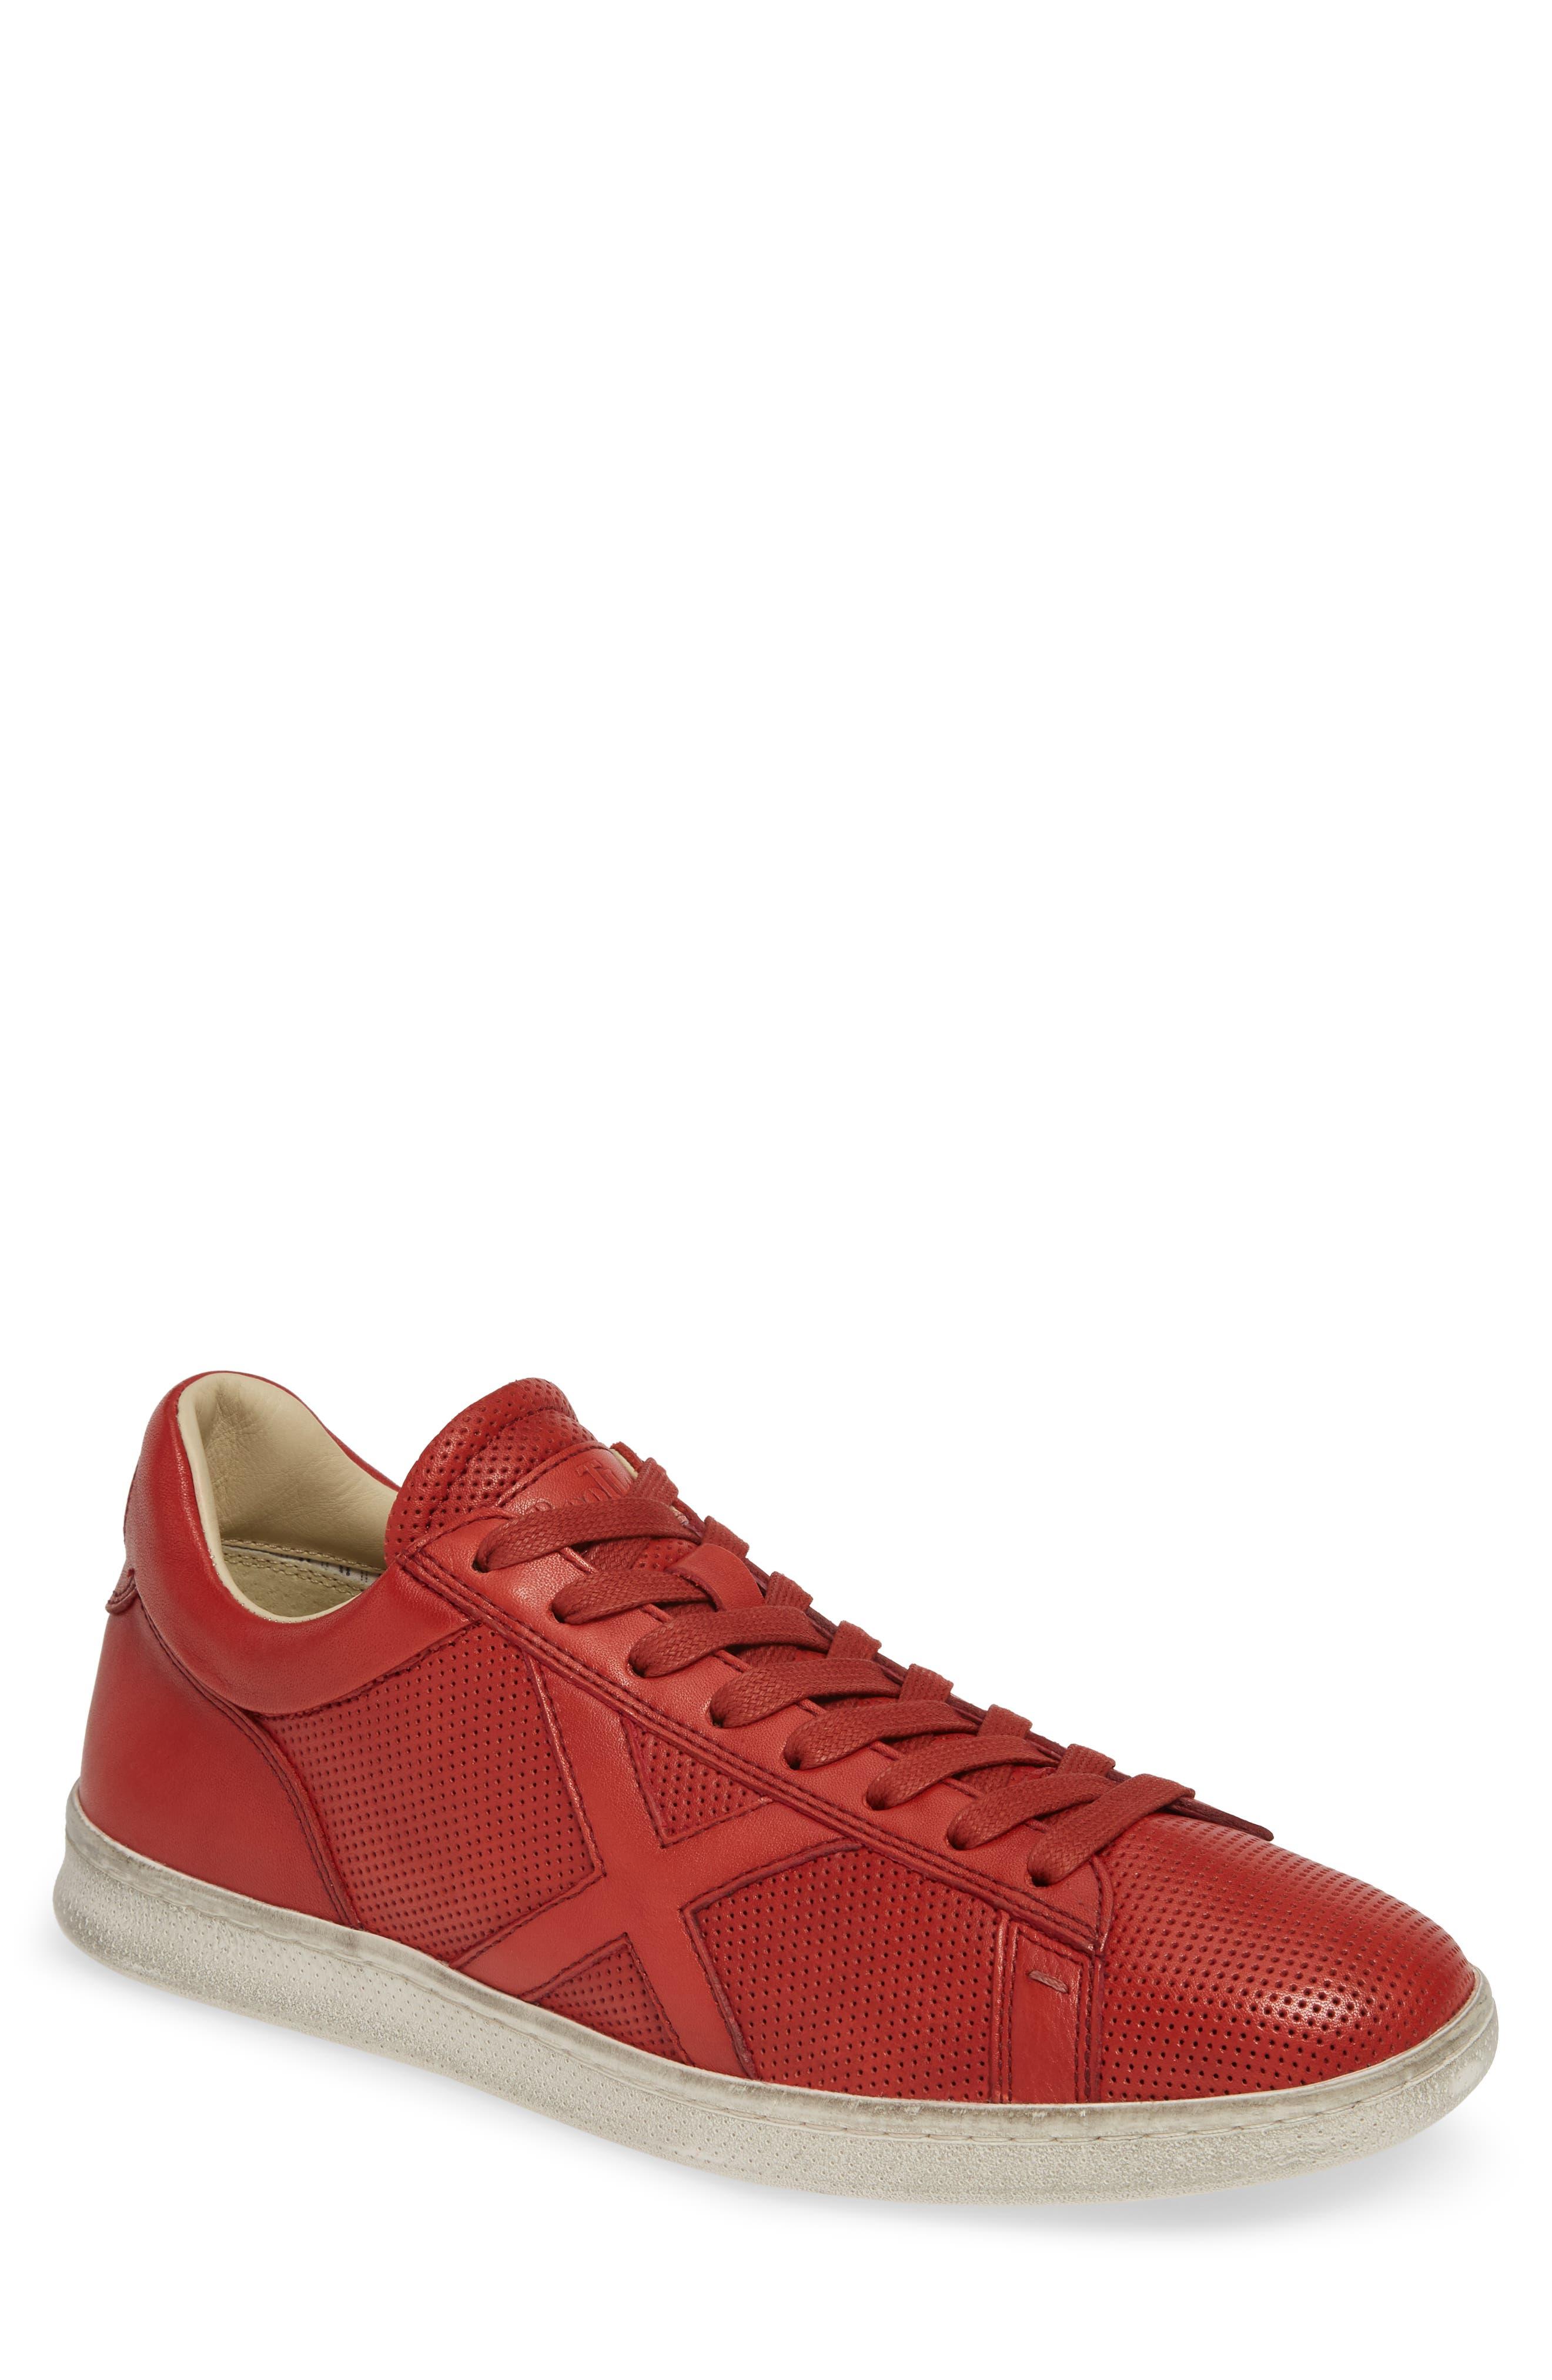 Bootleg By John Varvatos Perforated Sneaker, Red